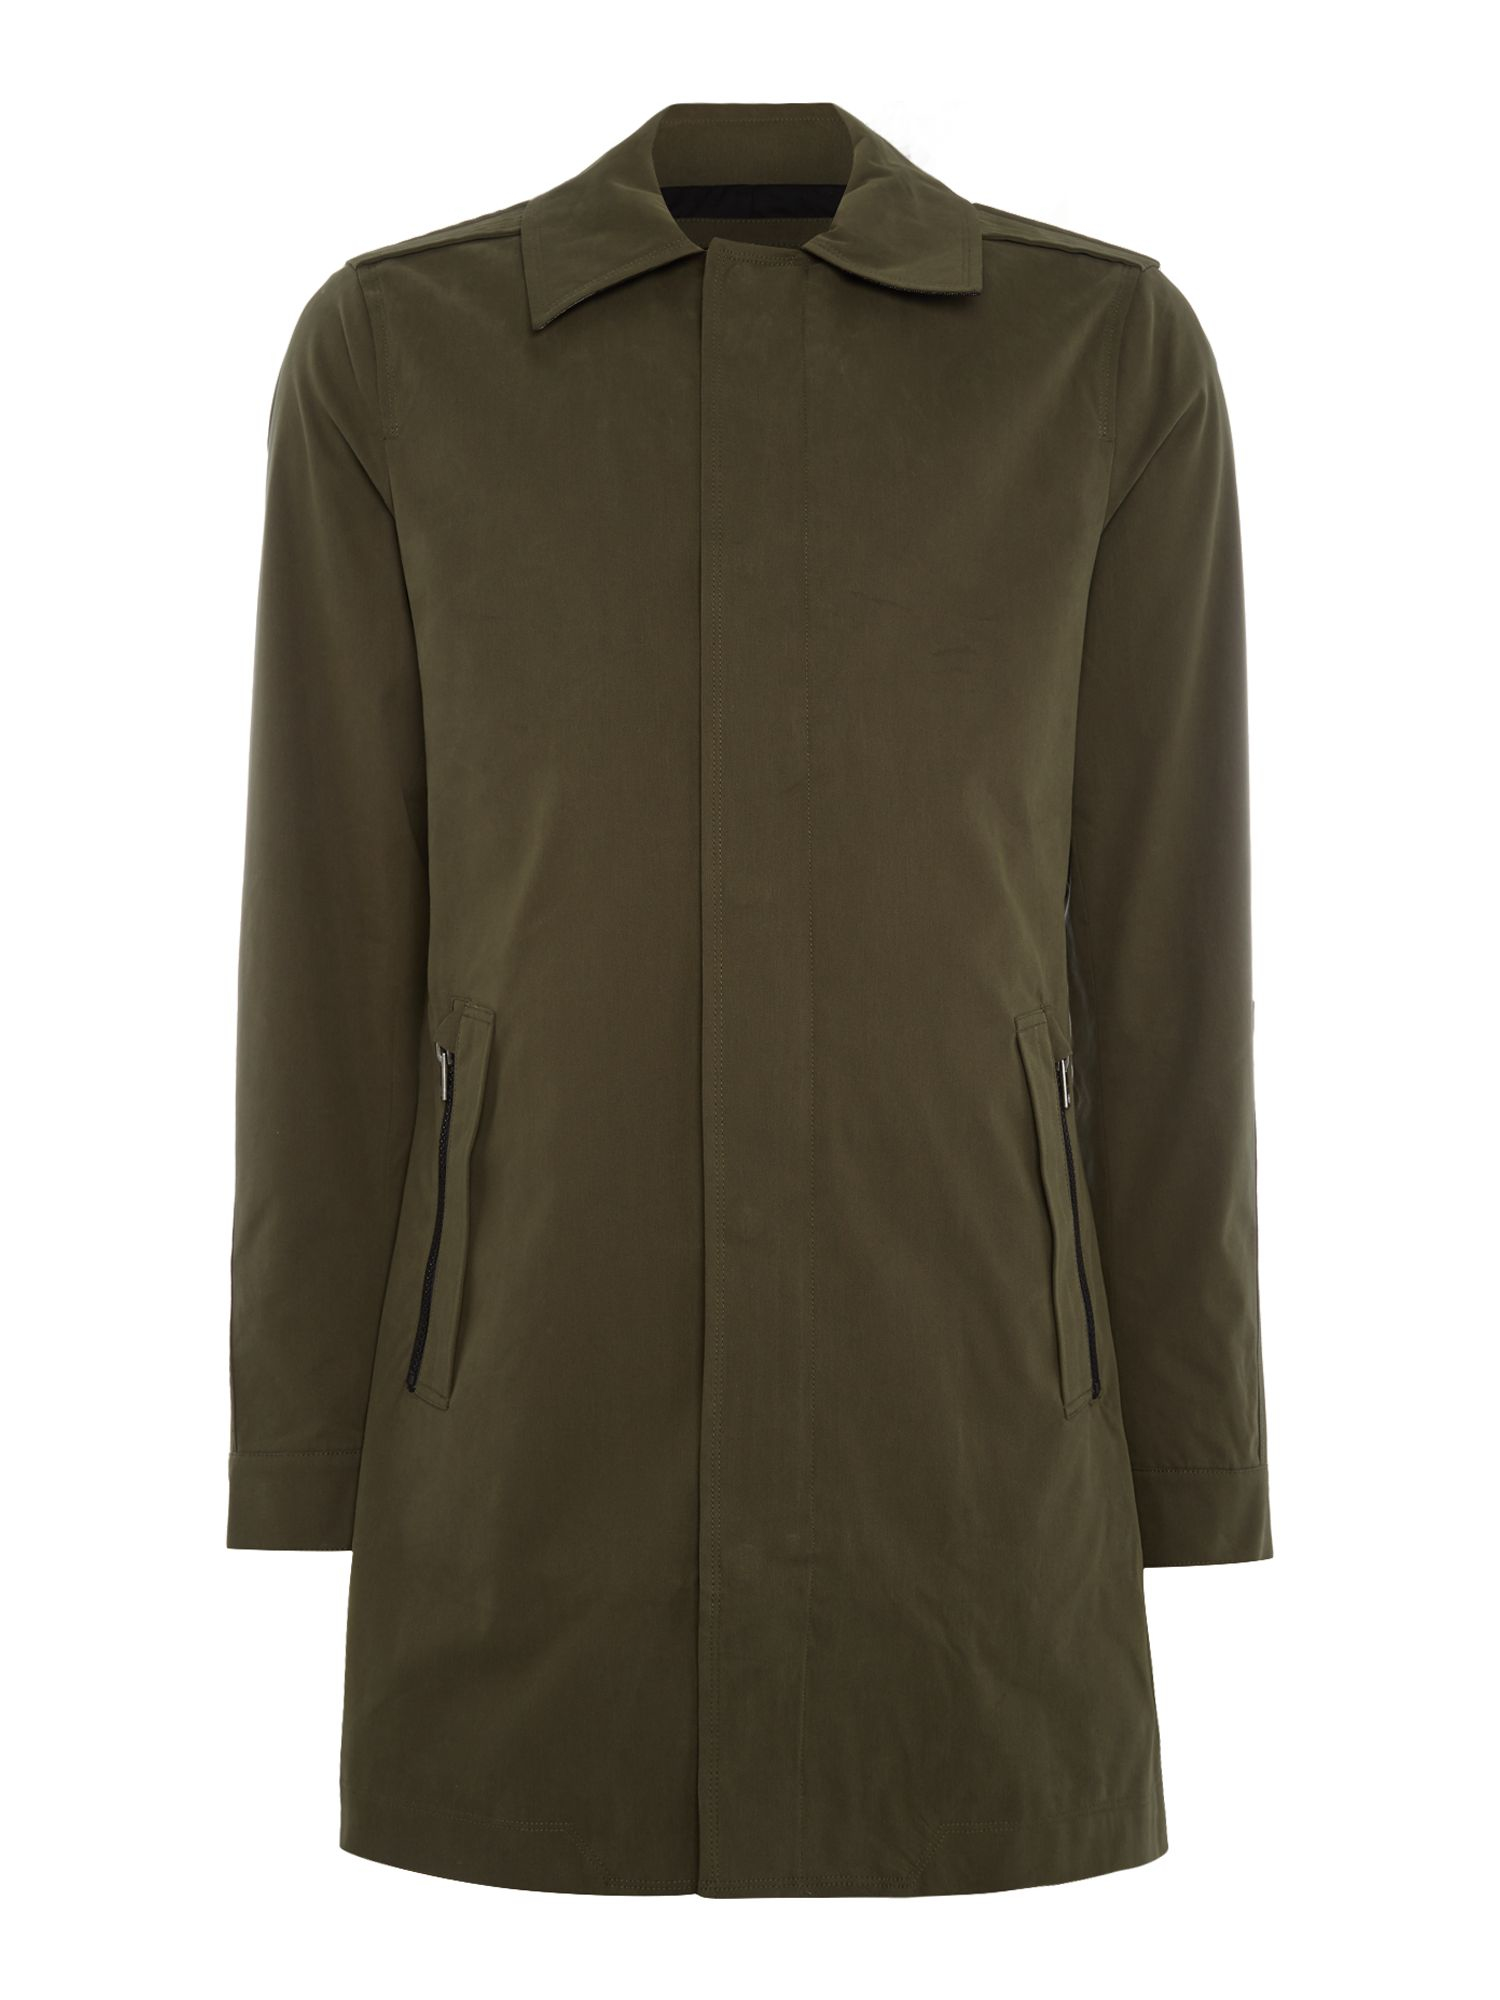 Calvin Klein Cotton Artis Mac Jacket In Olive Green For